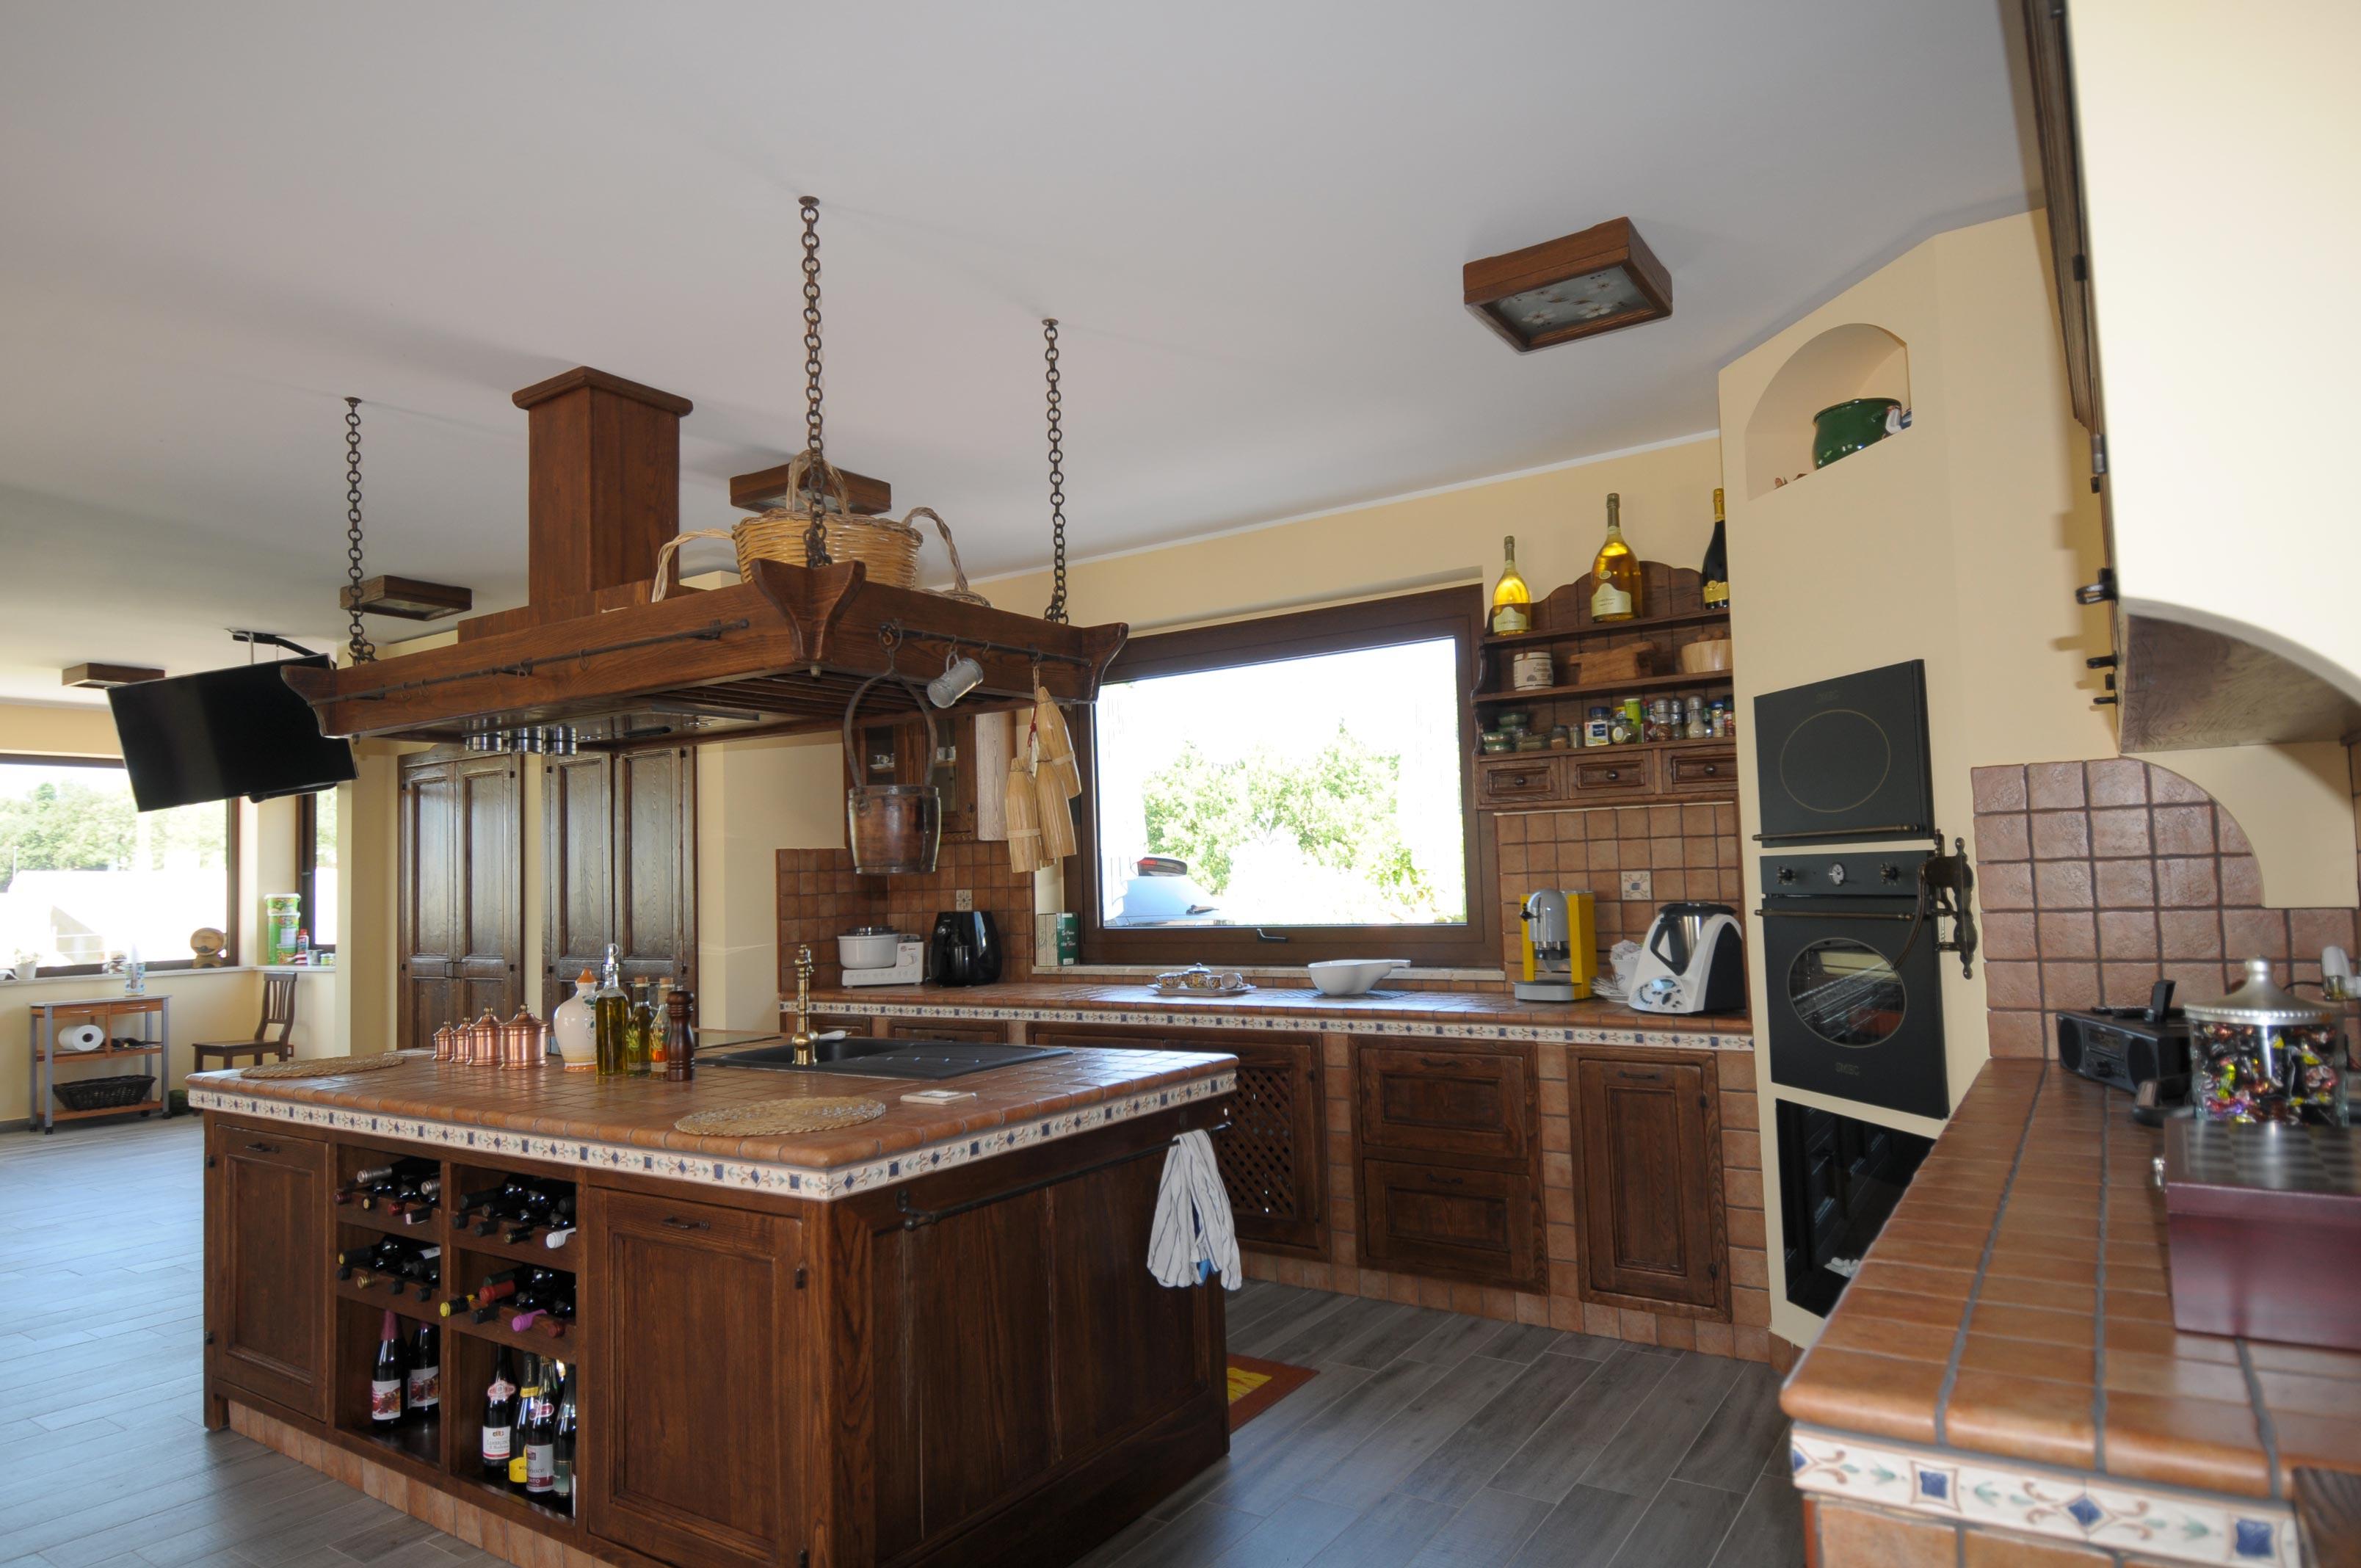 Piano Cottura In Muratura cucine in muratura - progettazioni, ristrutturazioni e